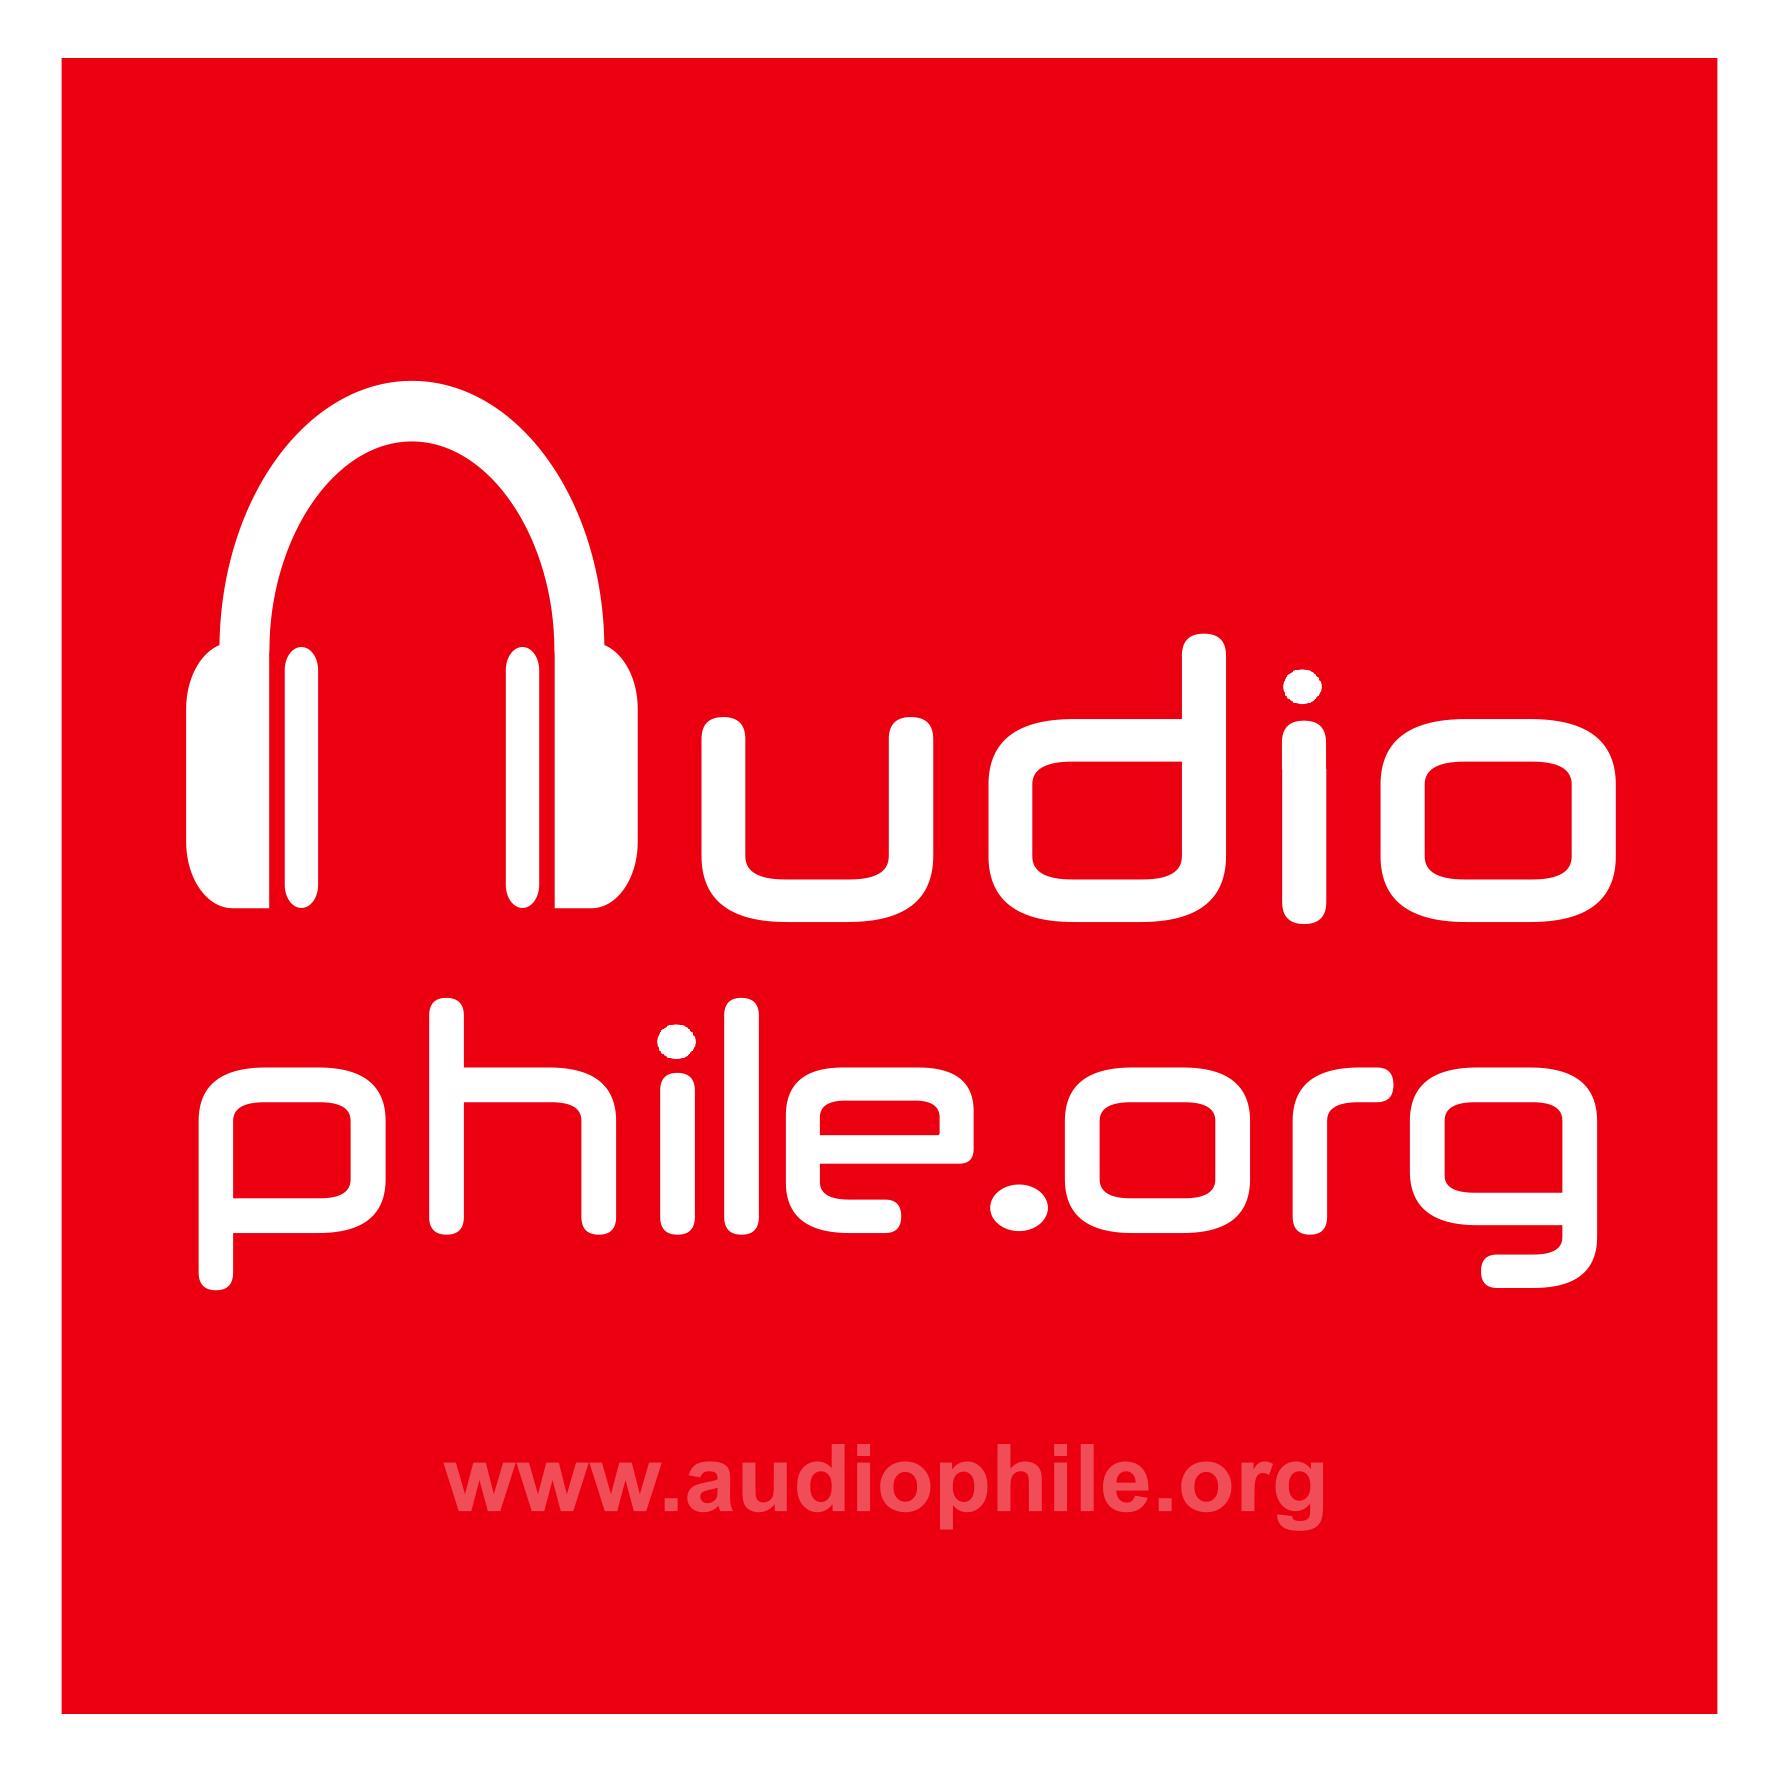 Audiophile.org